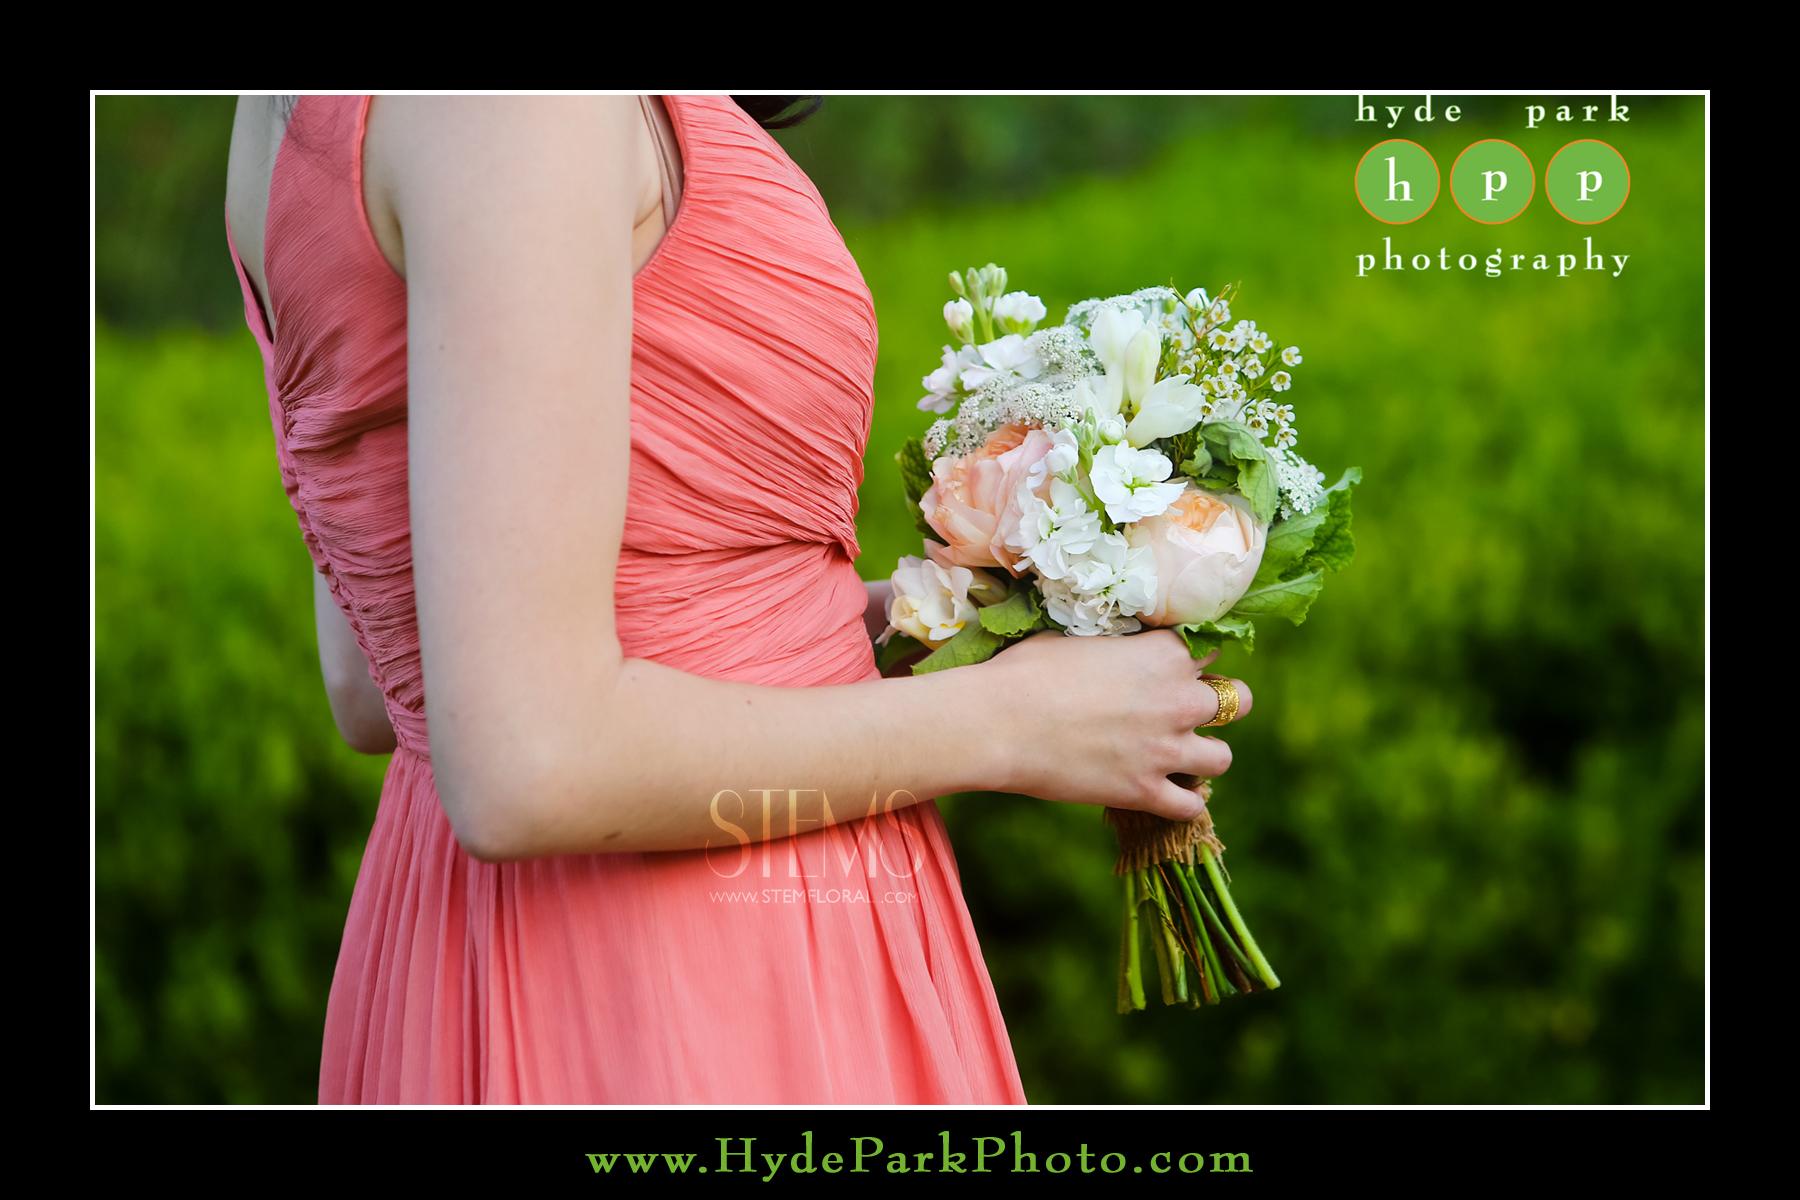 www.stemfloral.com